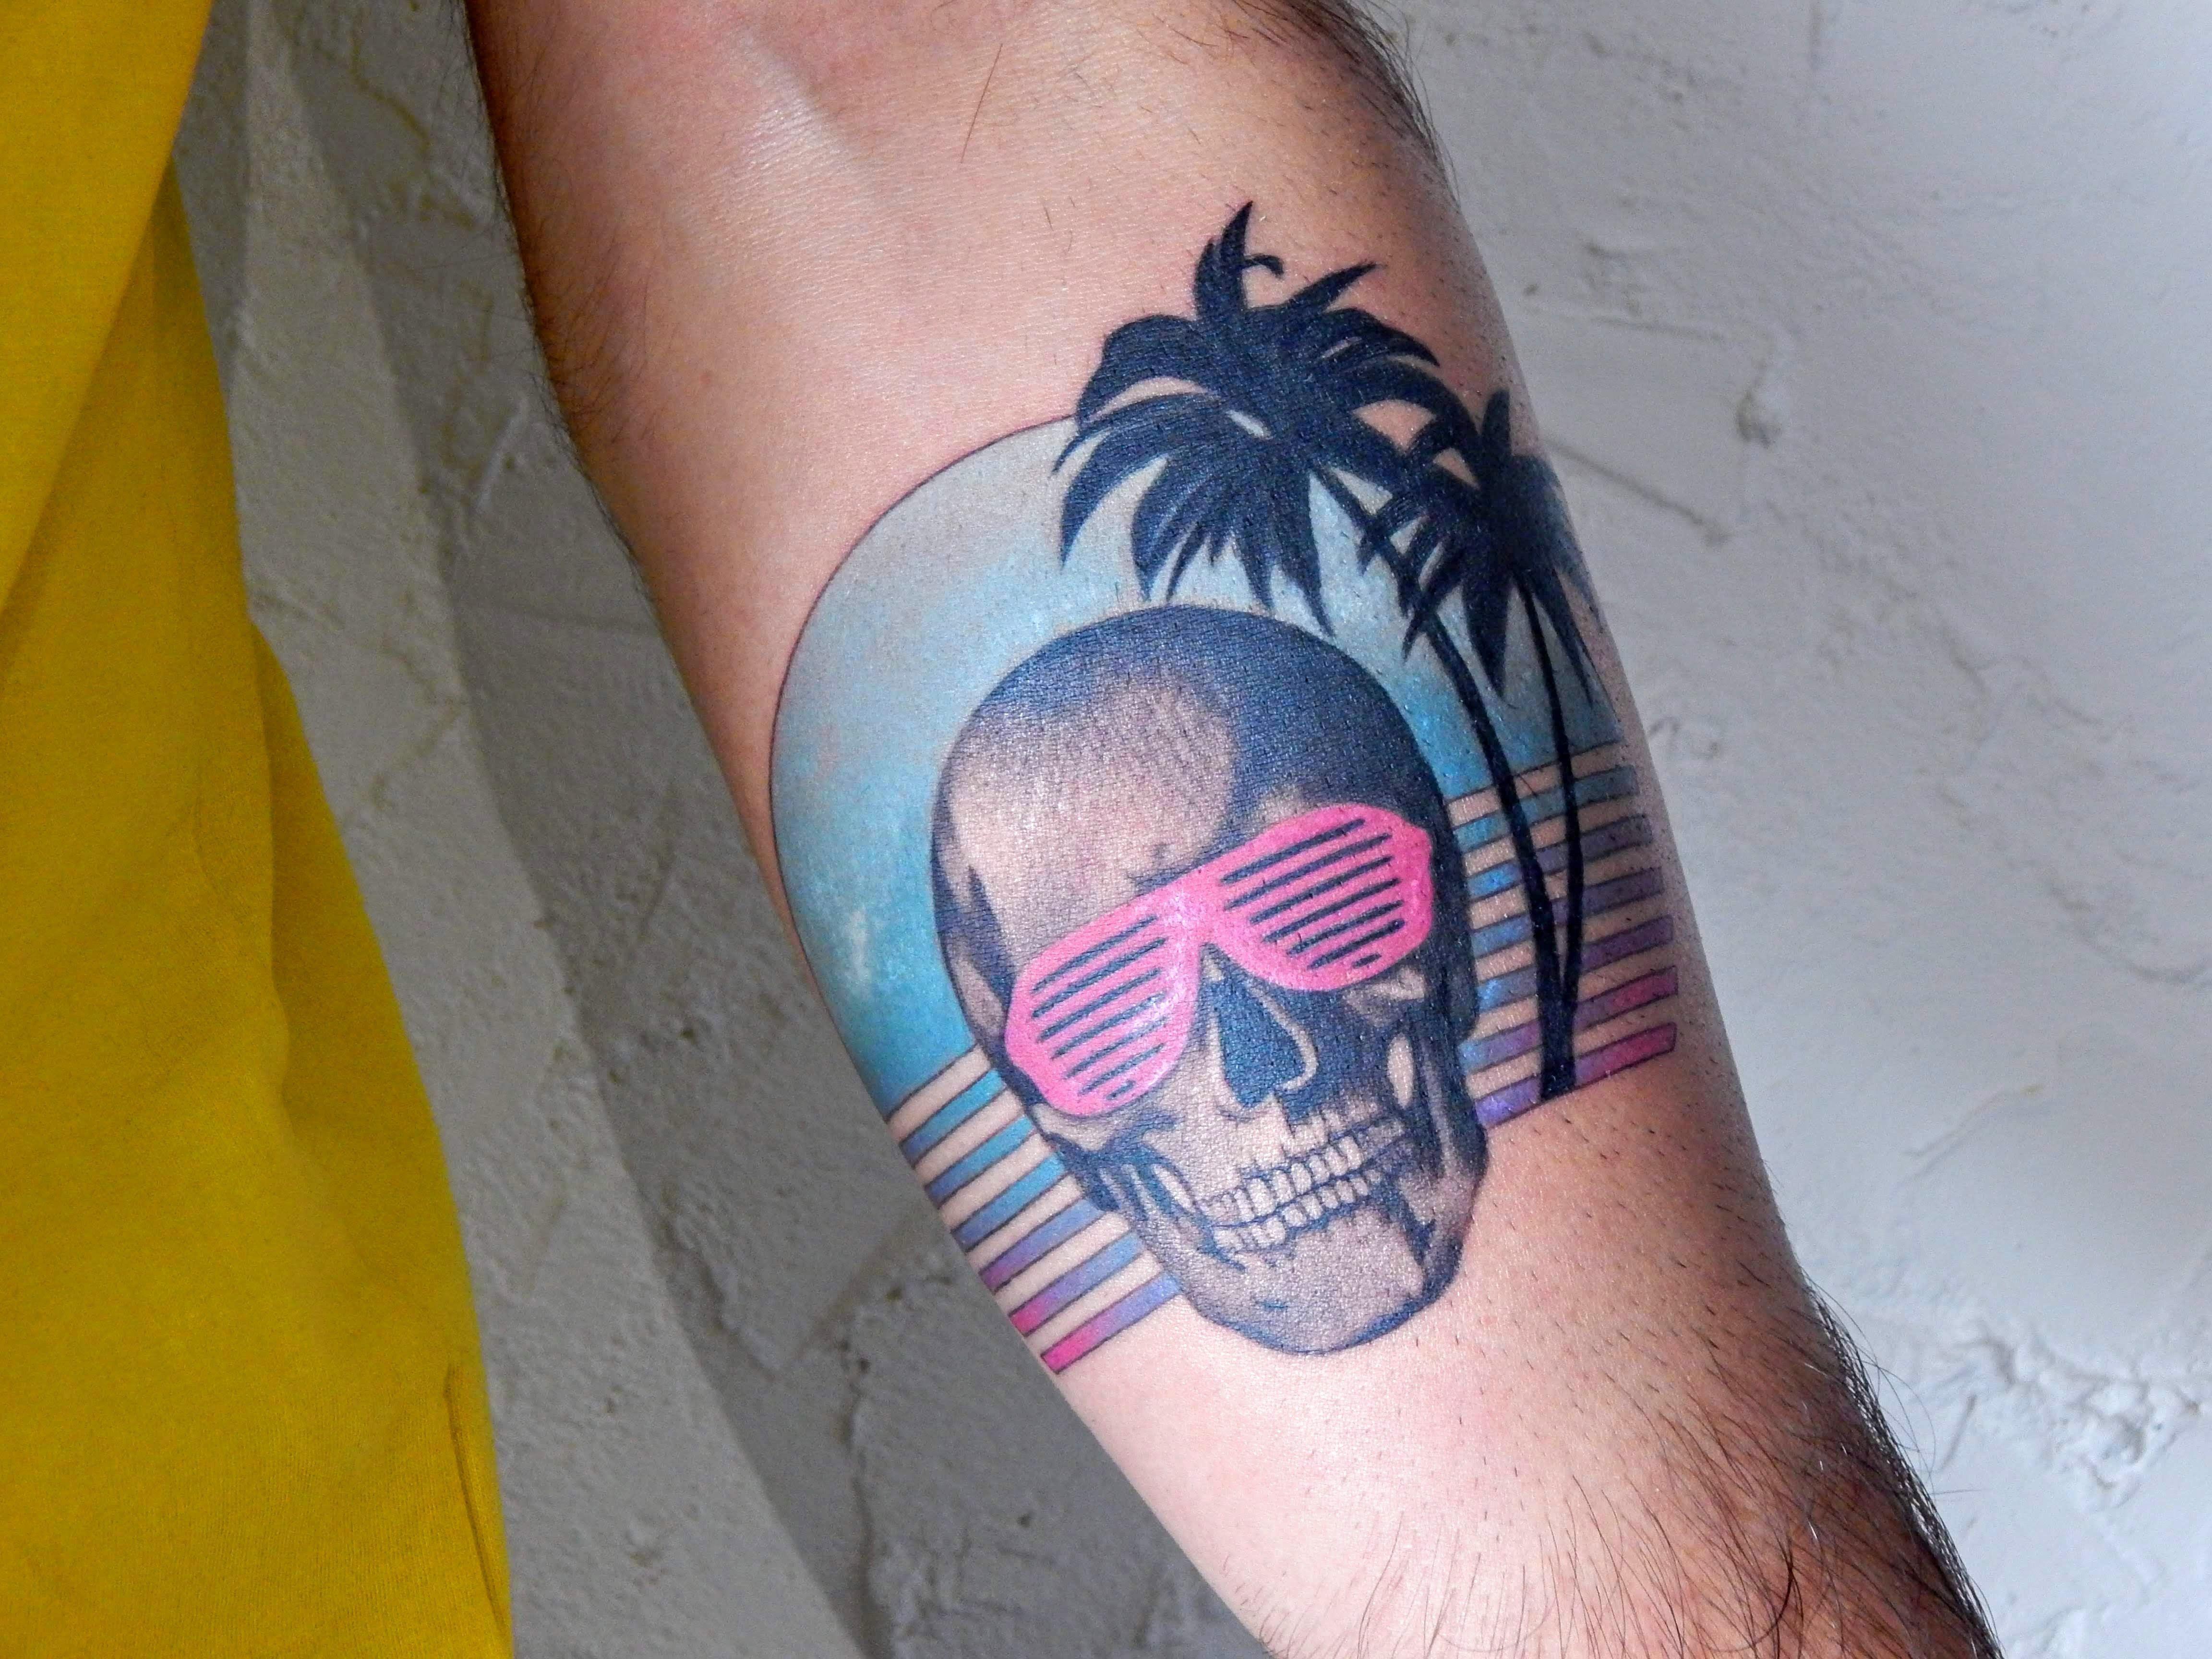 Vaporwave Tattoo Vaporwave In 2020 Retro Tattoos Arm Sleeve Tattoos Ems Tattoos